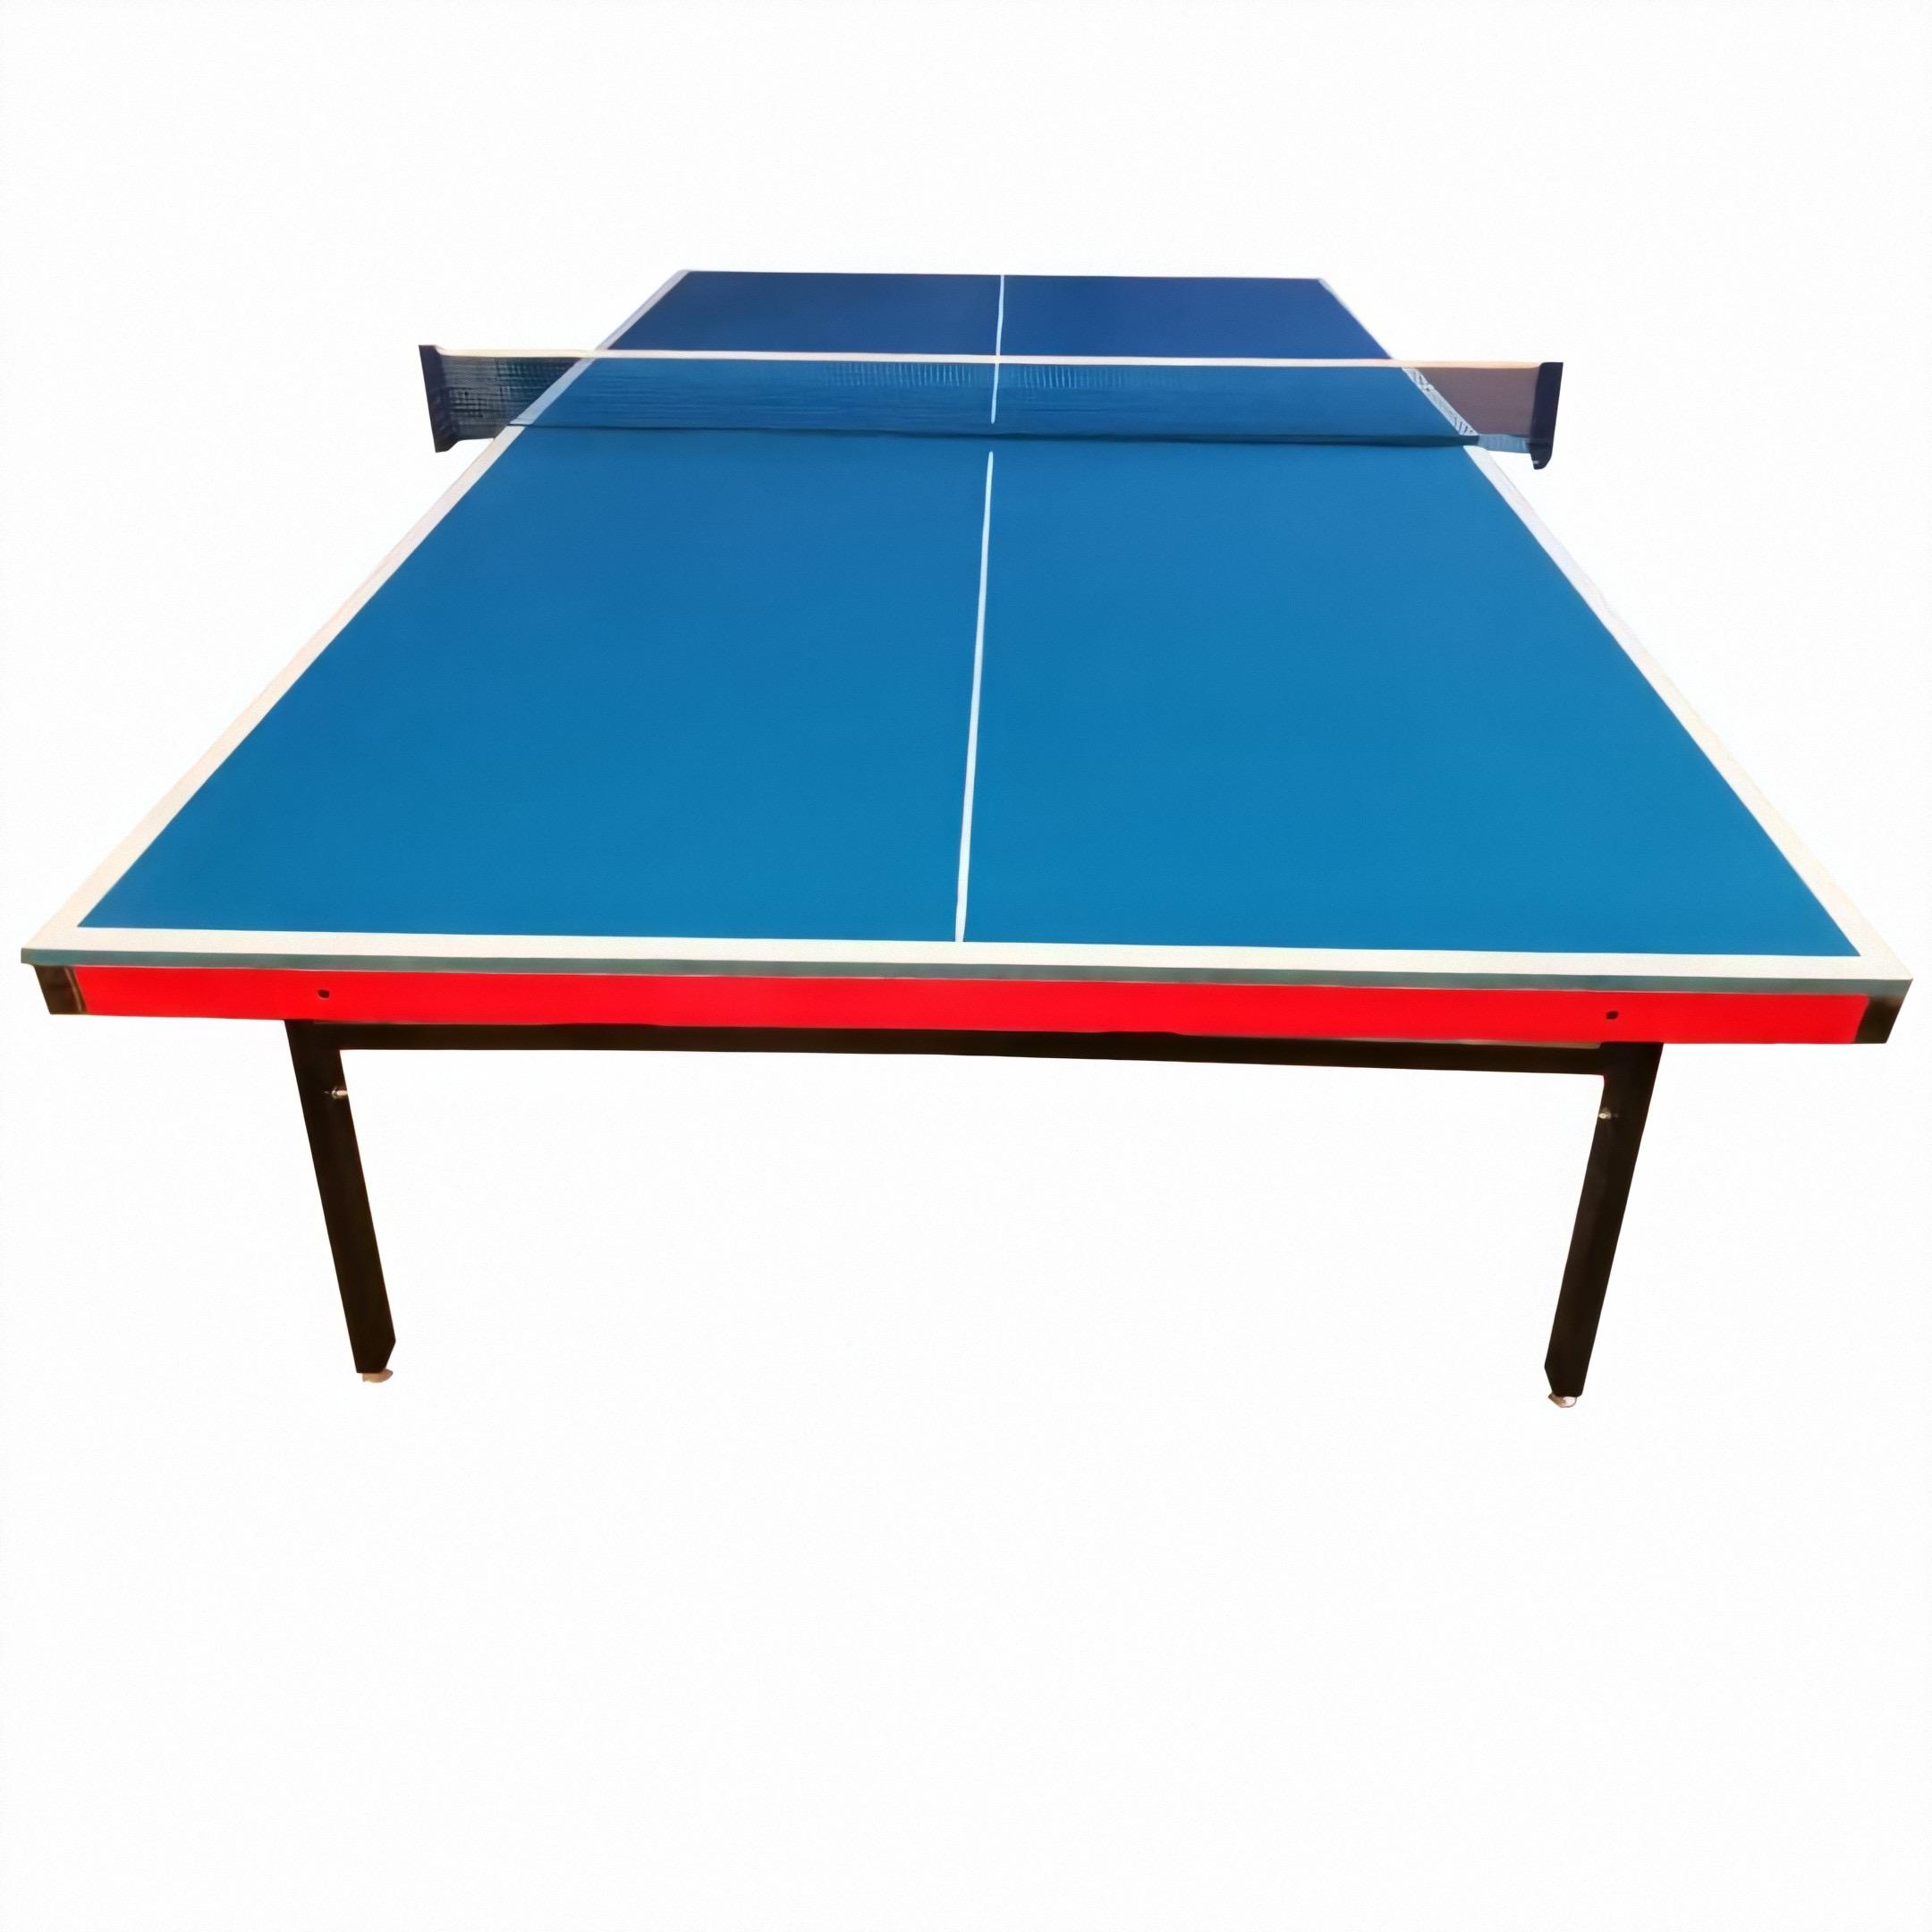 میز پینگ پنگ مدل TU1